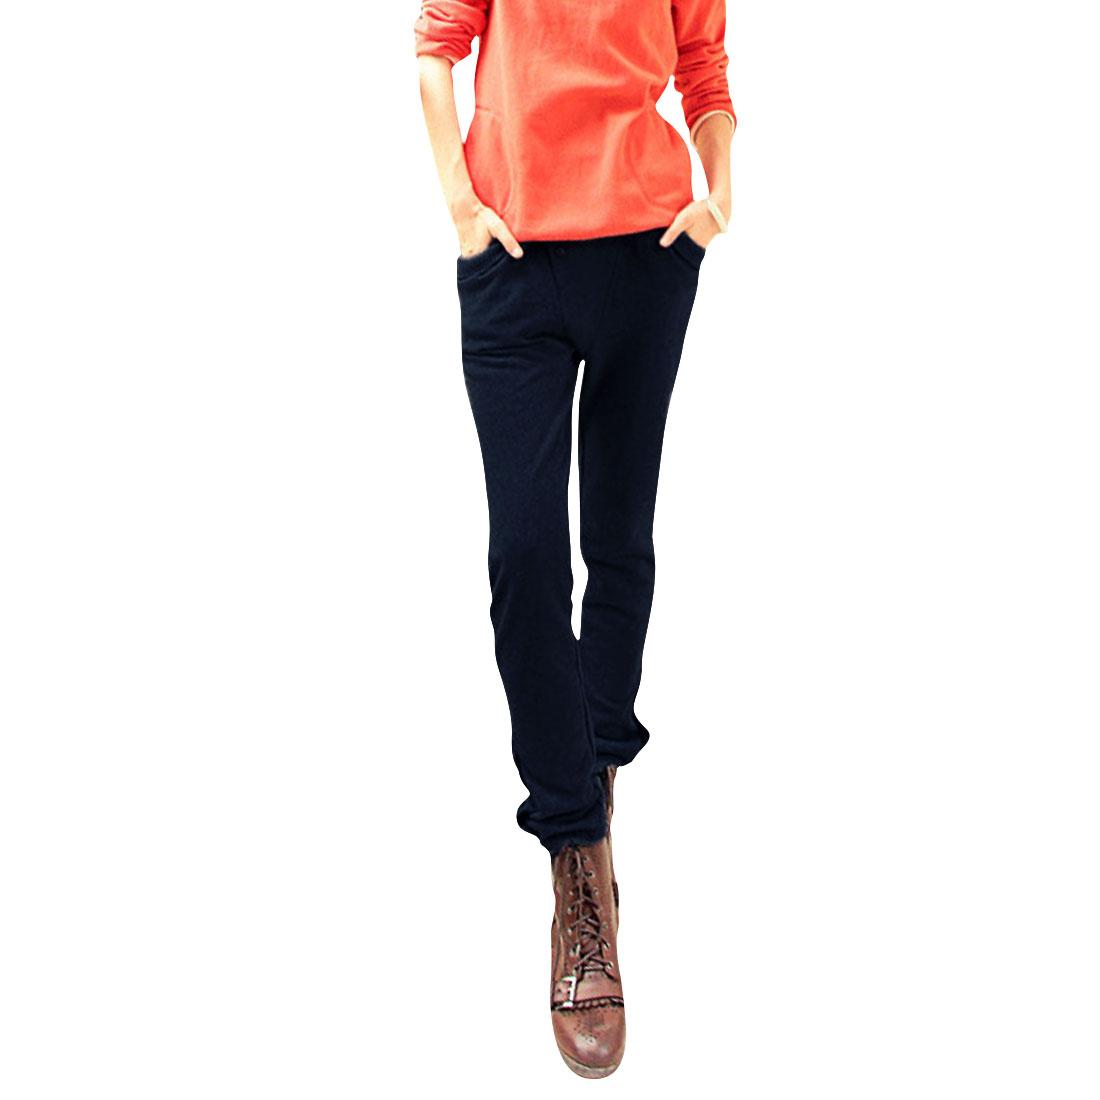 Sports Elastic Low Waist Dark Blue Fleece Pants For Women XS